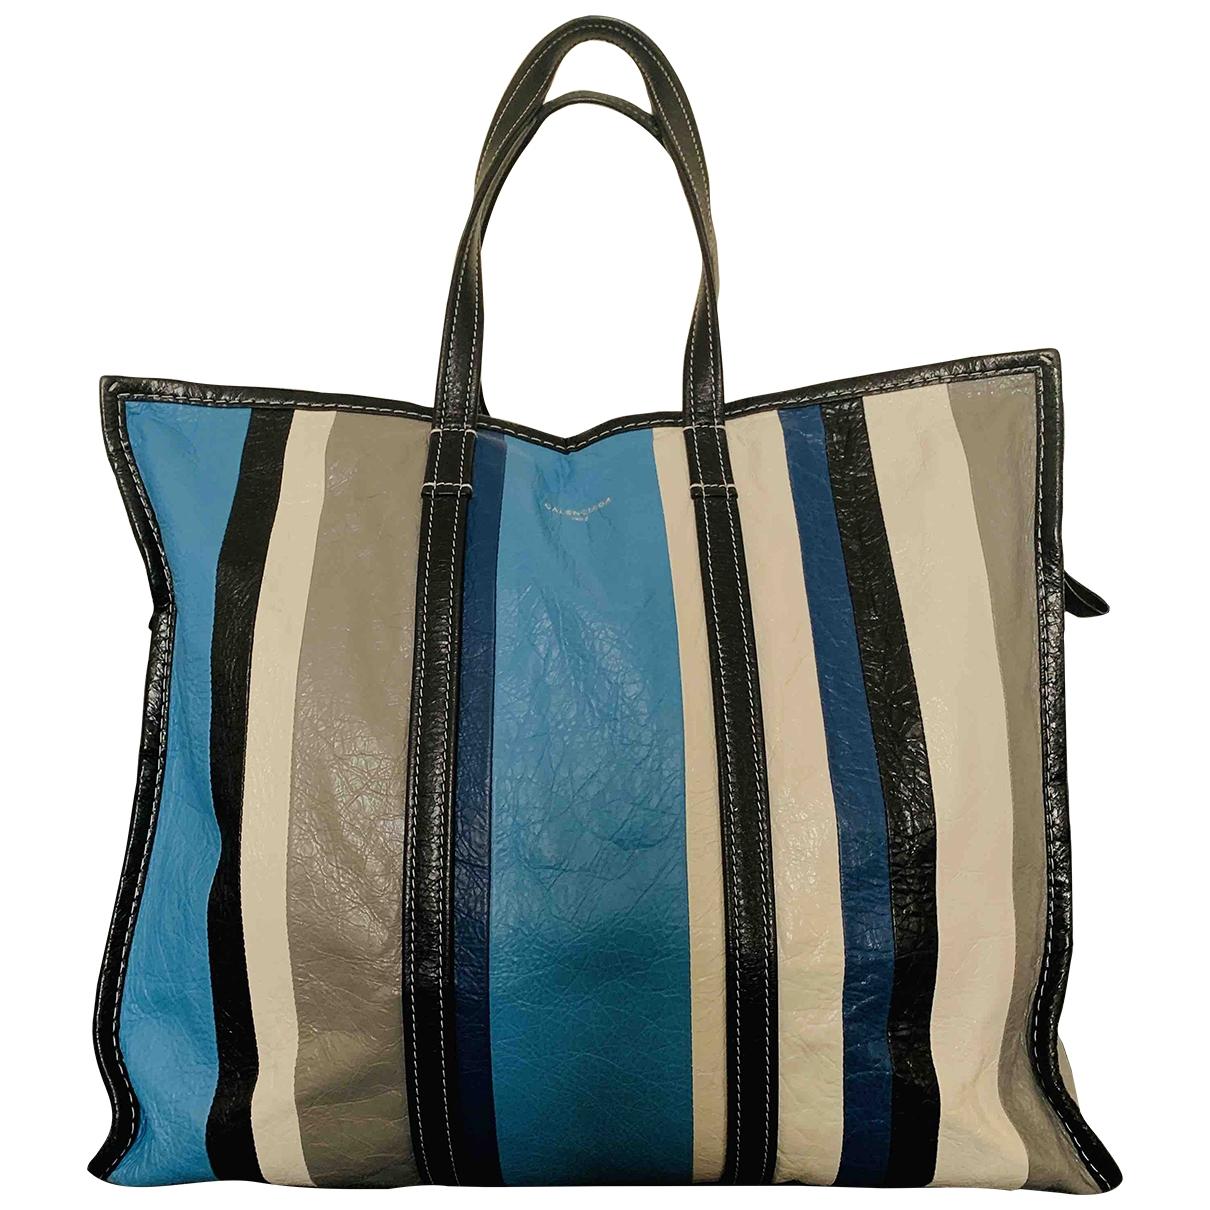 Balenciaga - Sac a main Bazar Bag pour femme en cuir